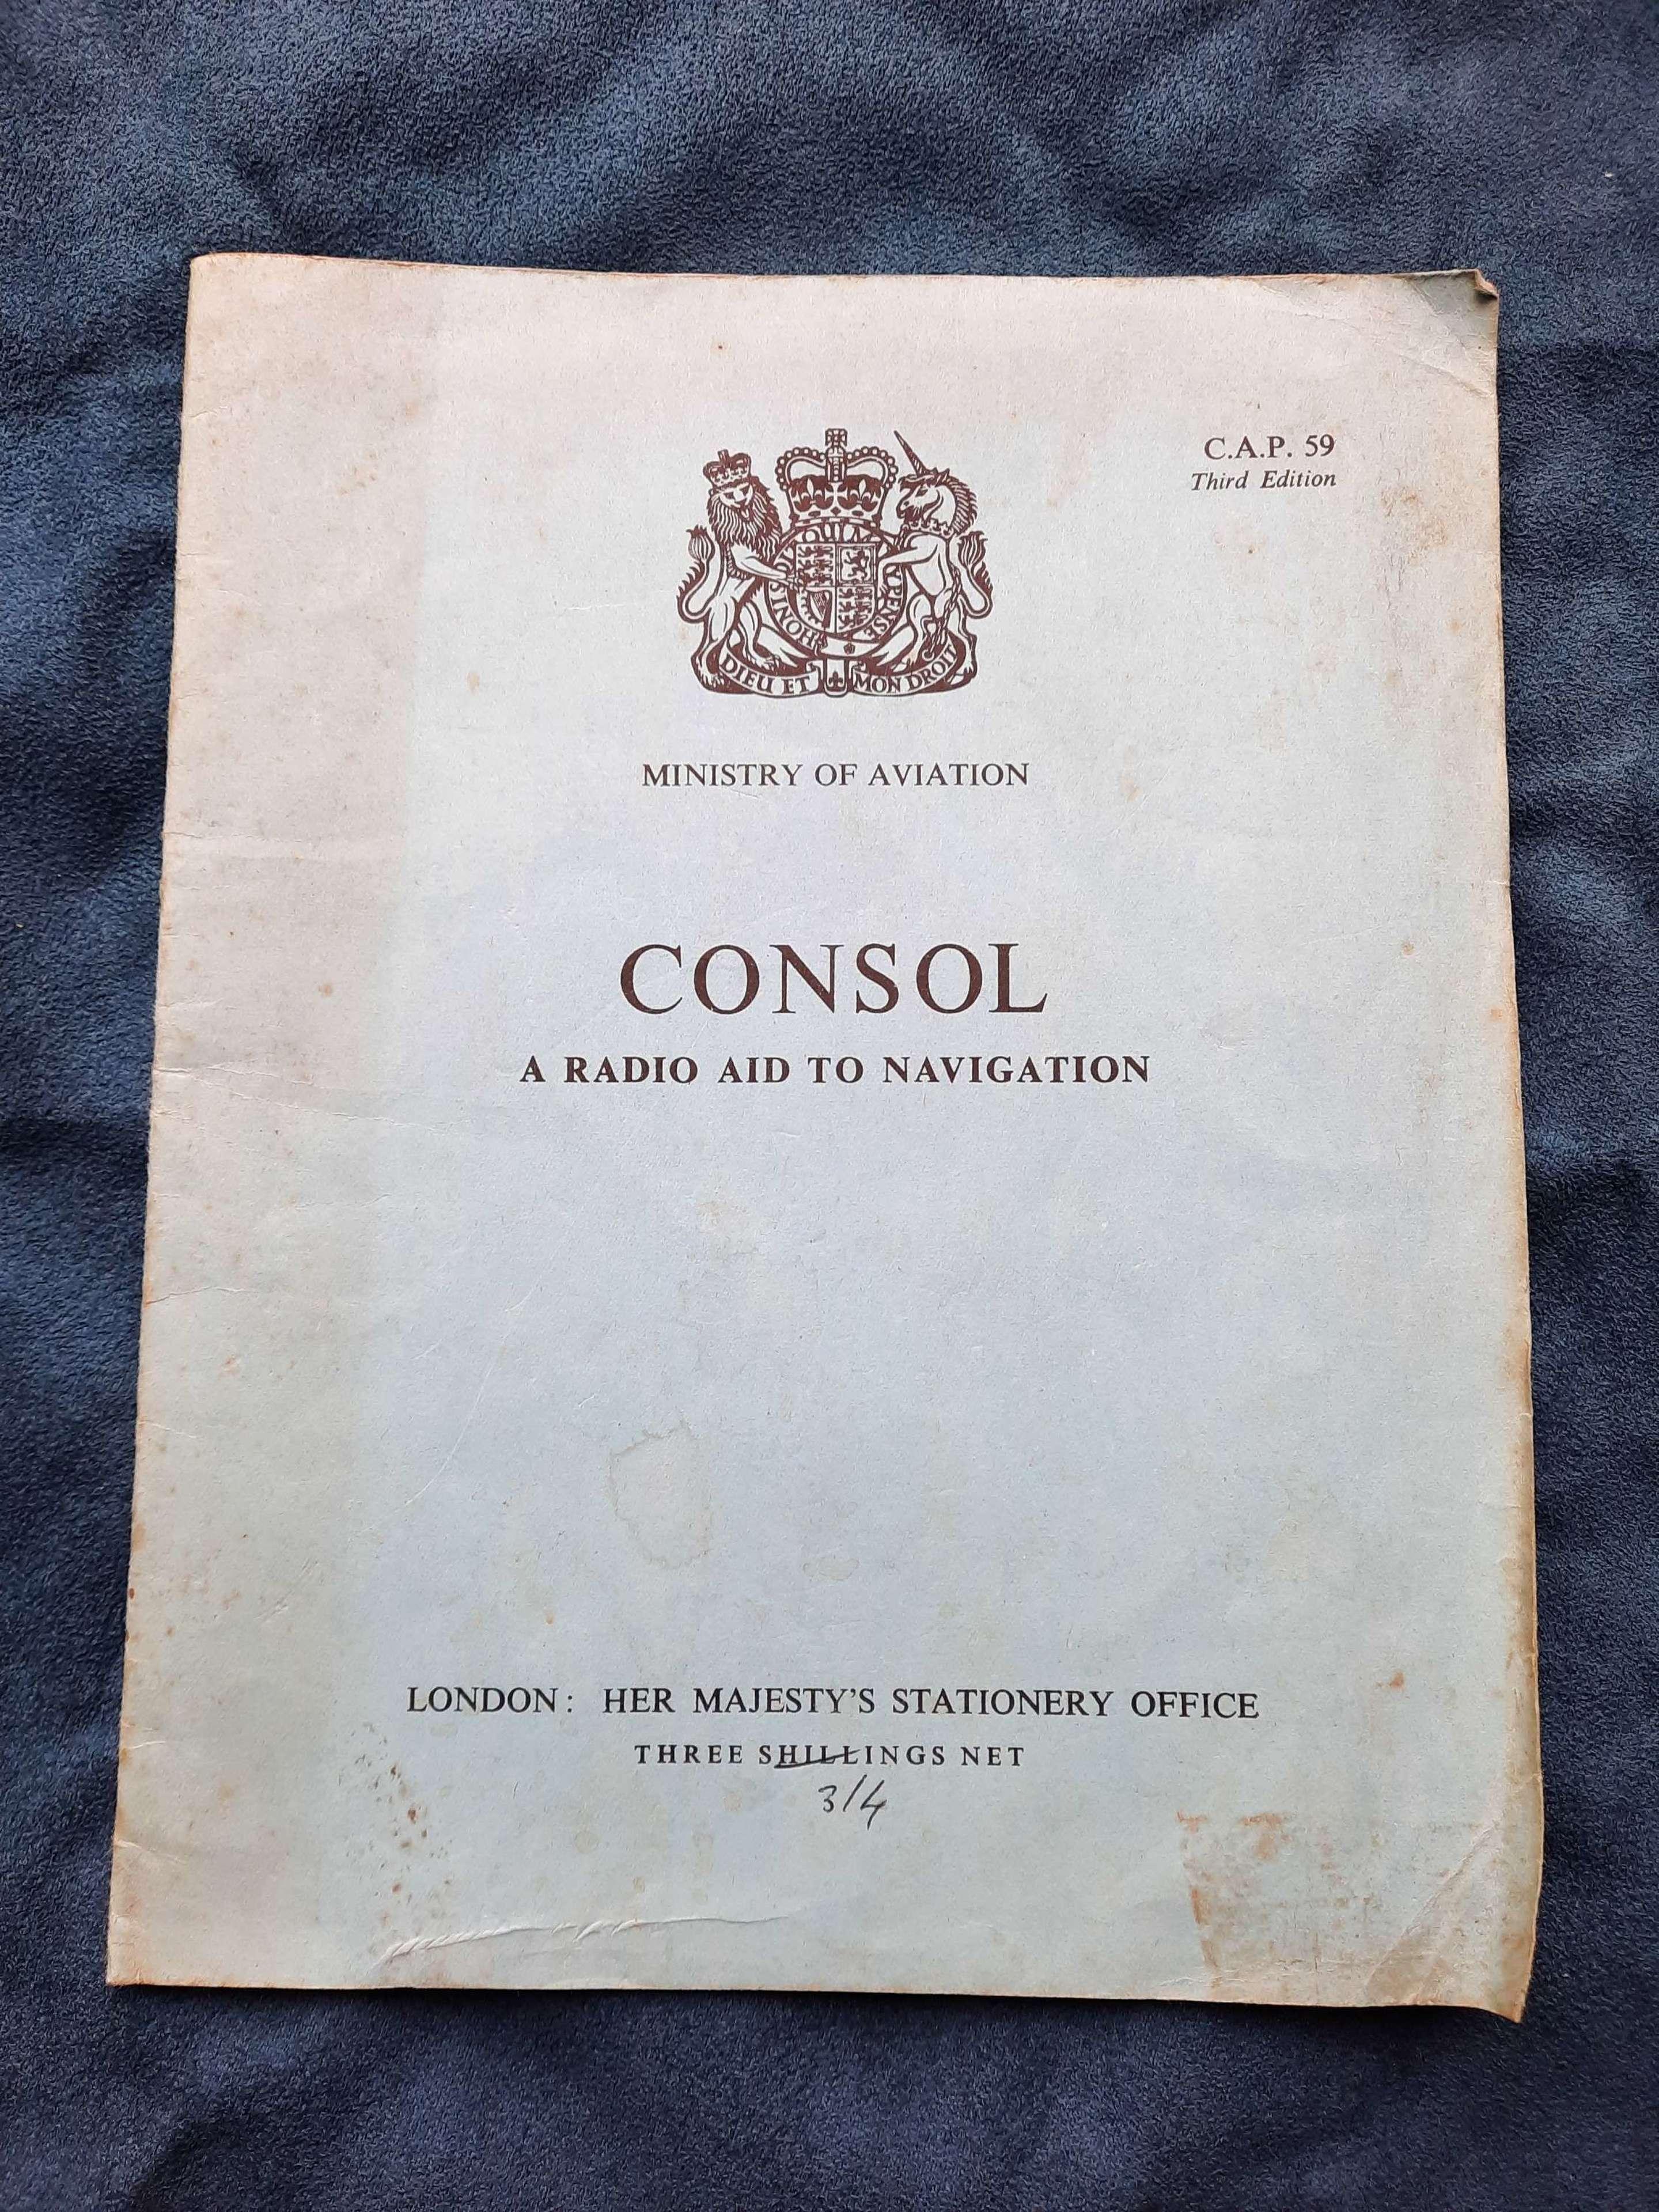 CONSOL A Radio Aid to Navigation